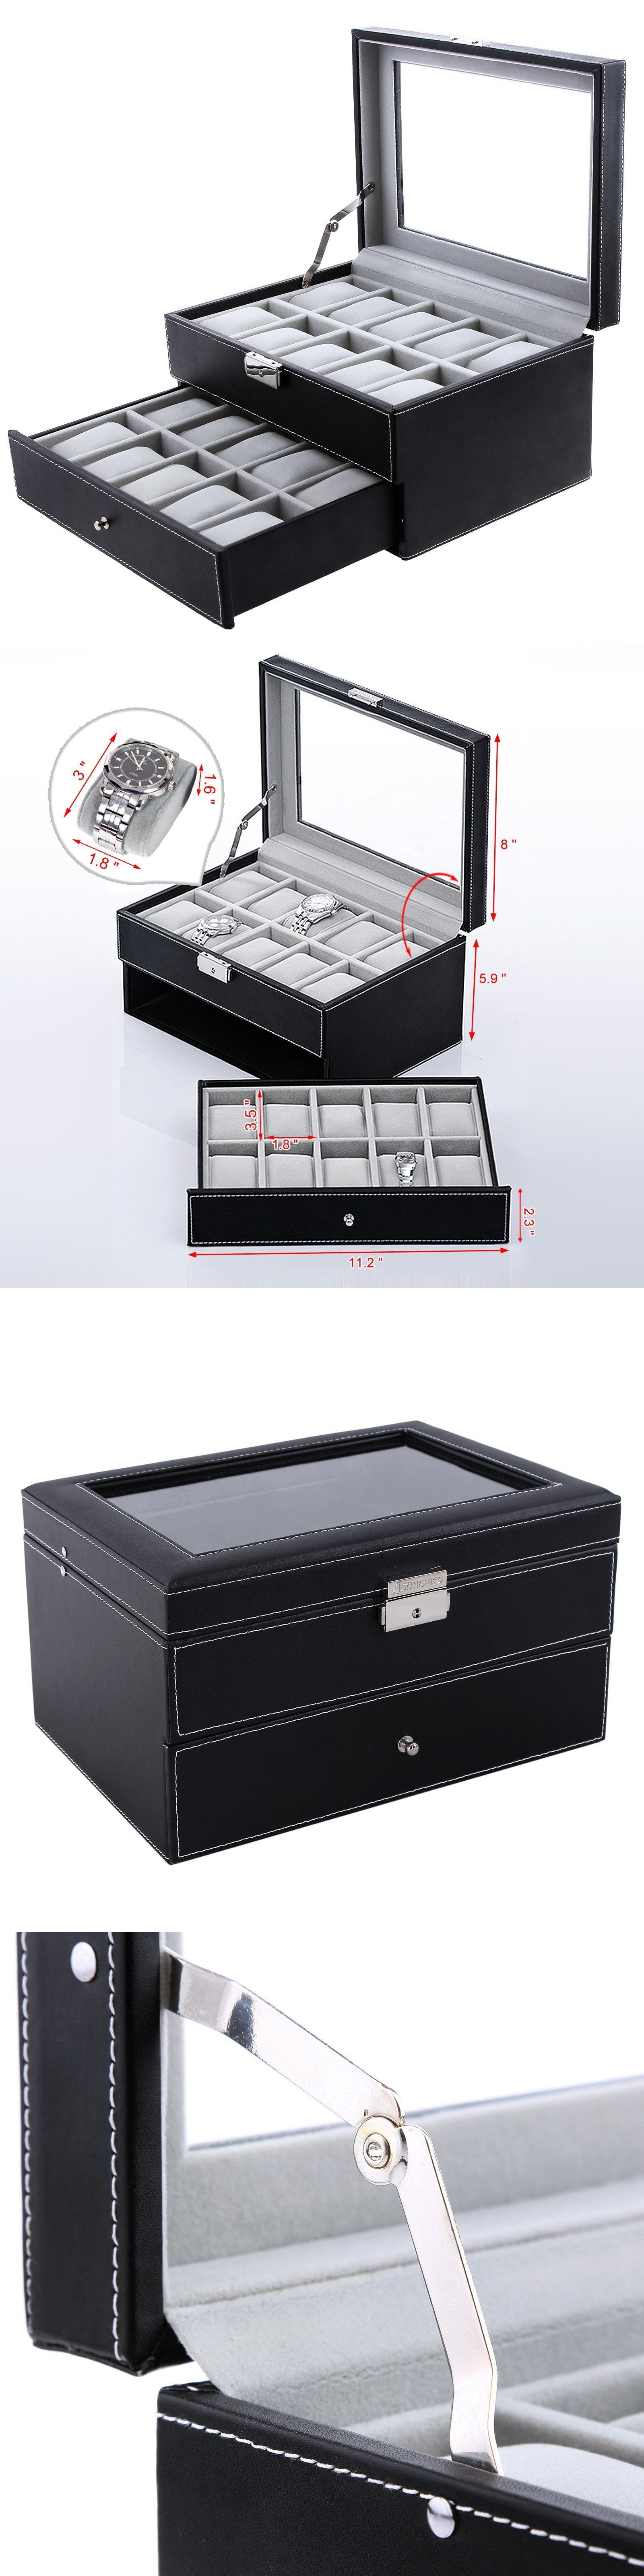 watch 168164 songmics 20 mens watch box case glass top black watch 168164 songmics 20 mens watch box case glass top black display organizer lockable ujwb0